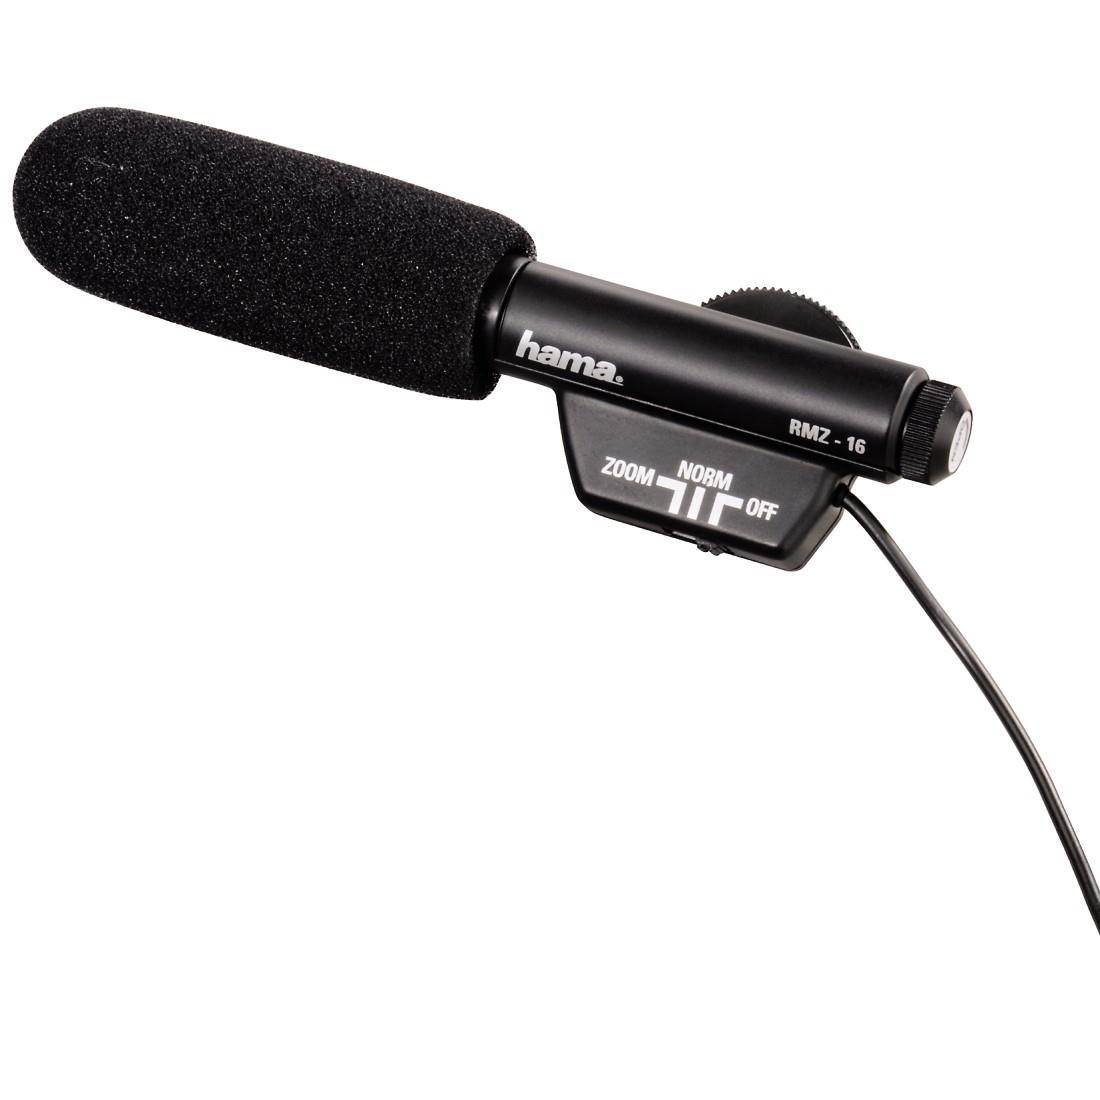 Hama RMZ-16 Clip-On Directional Microphone (Black)